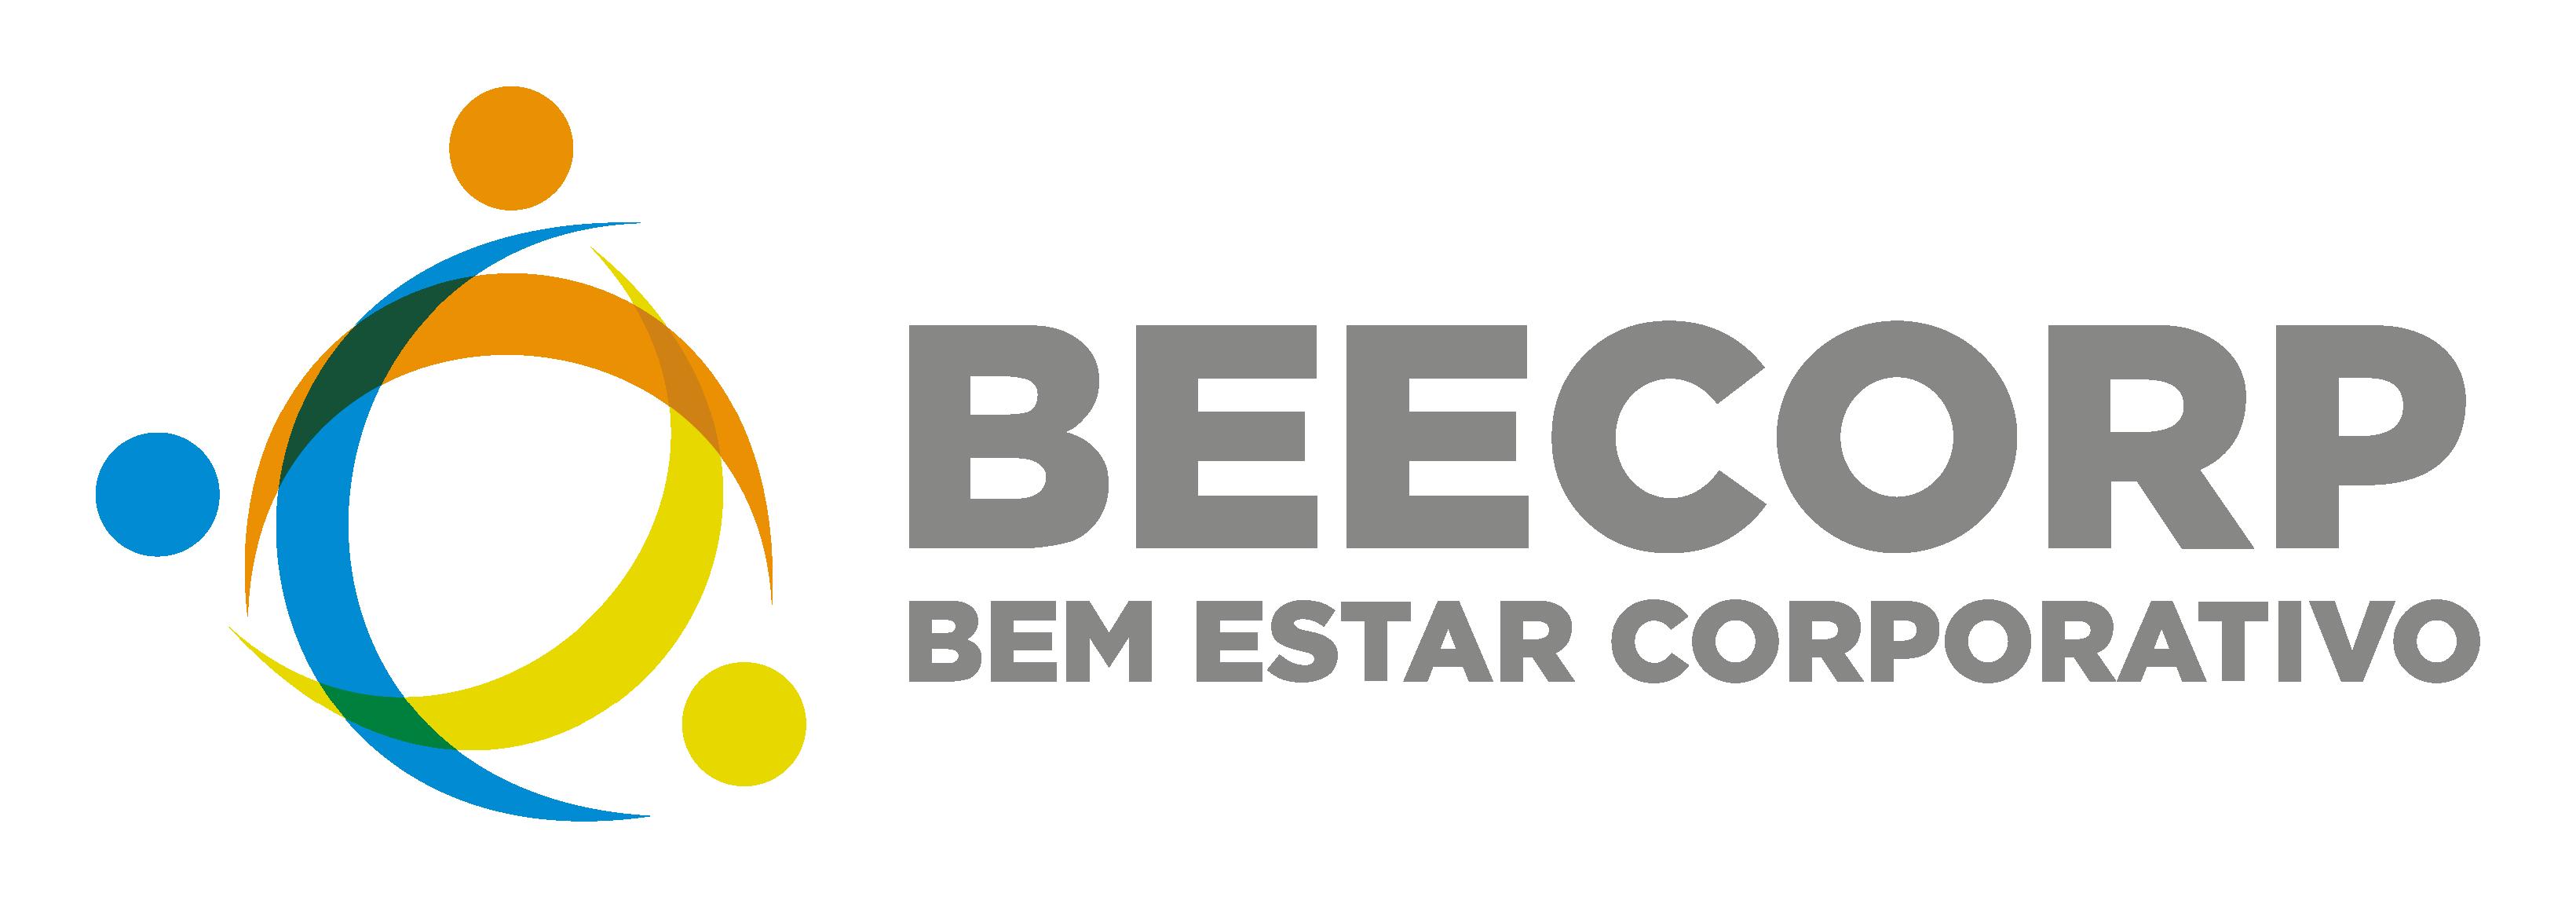 BeeCorp